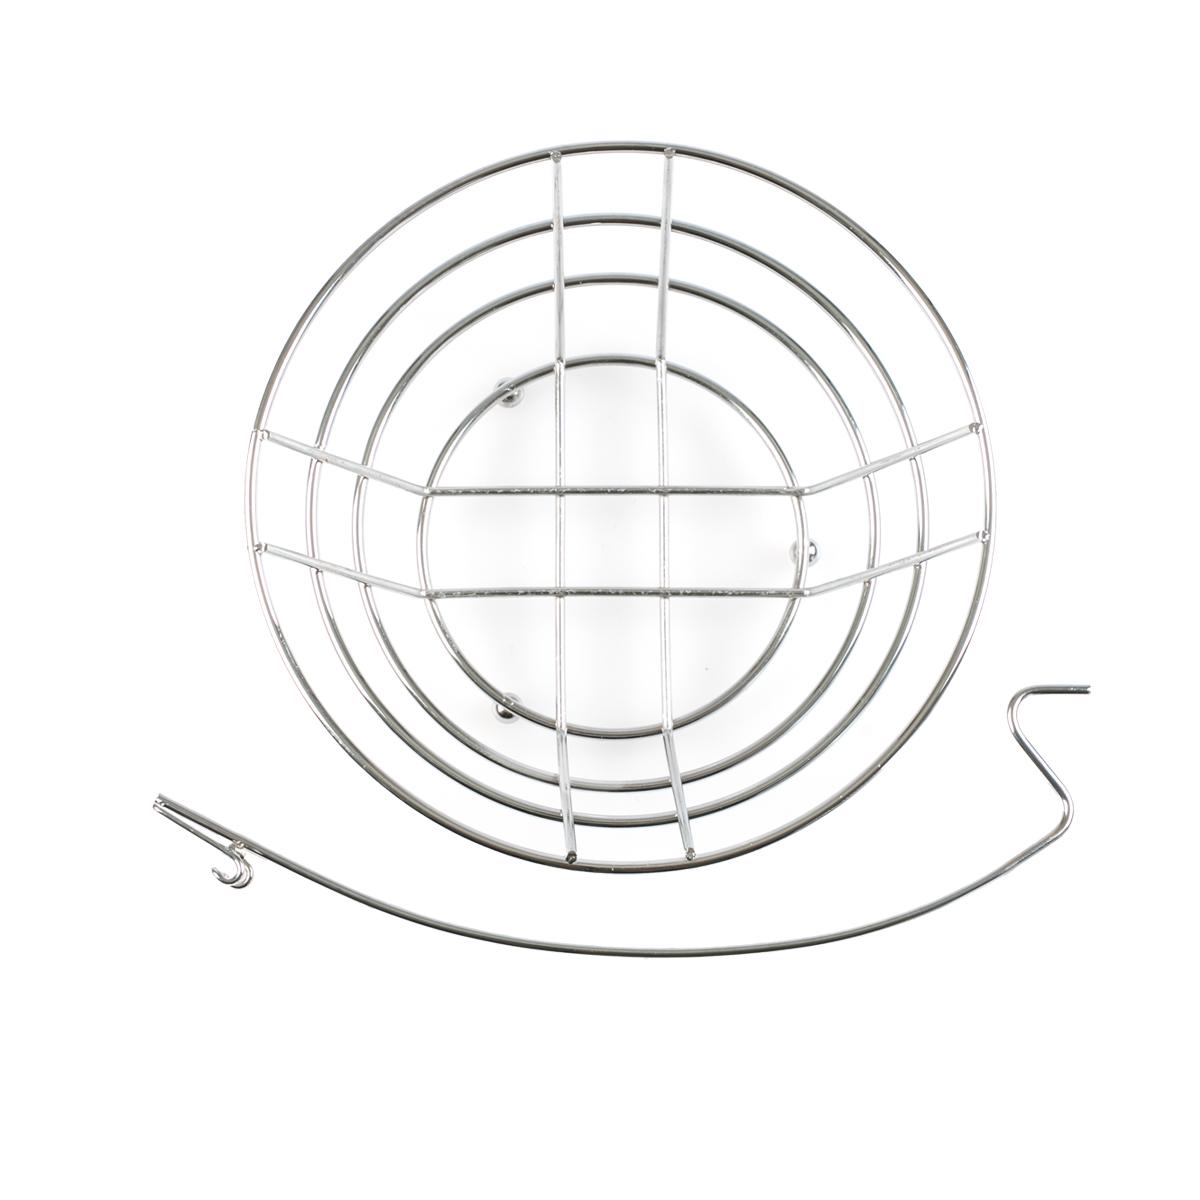 2 Kitchen Fruit Basket Produce Table Bowl Metal Chrome